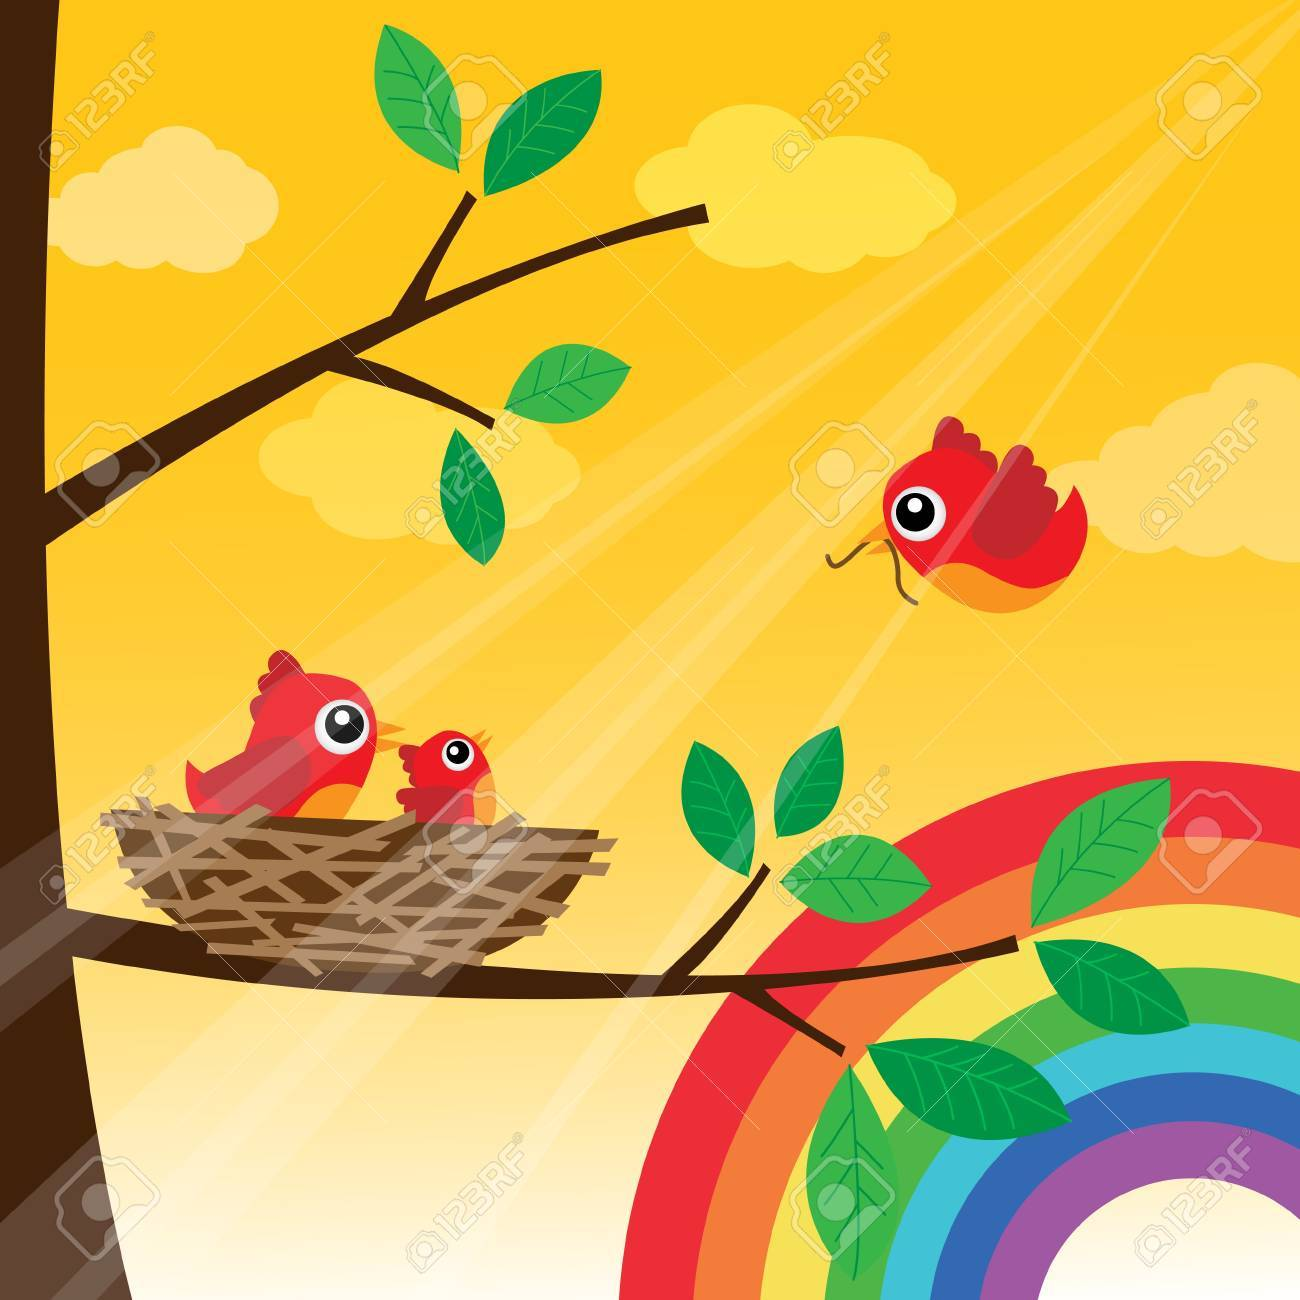 Loving bird feeding with rainbow Stock Vector - 15143407